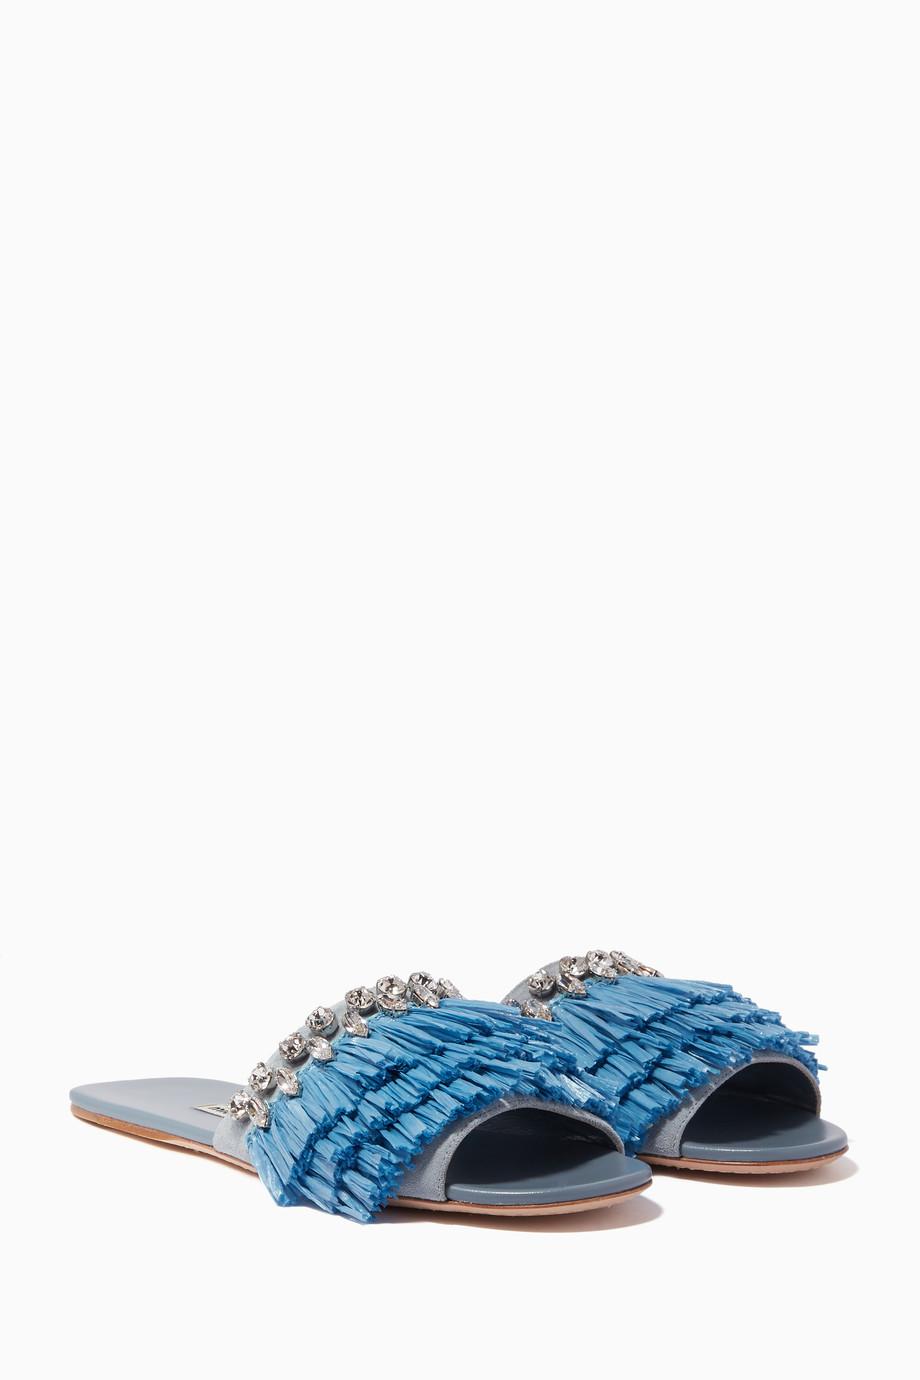 7e26835a227 Shop Miu Miu Blue Blue Raffia   Crystal Embellished Sandals for ...